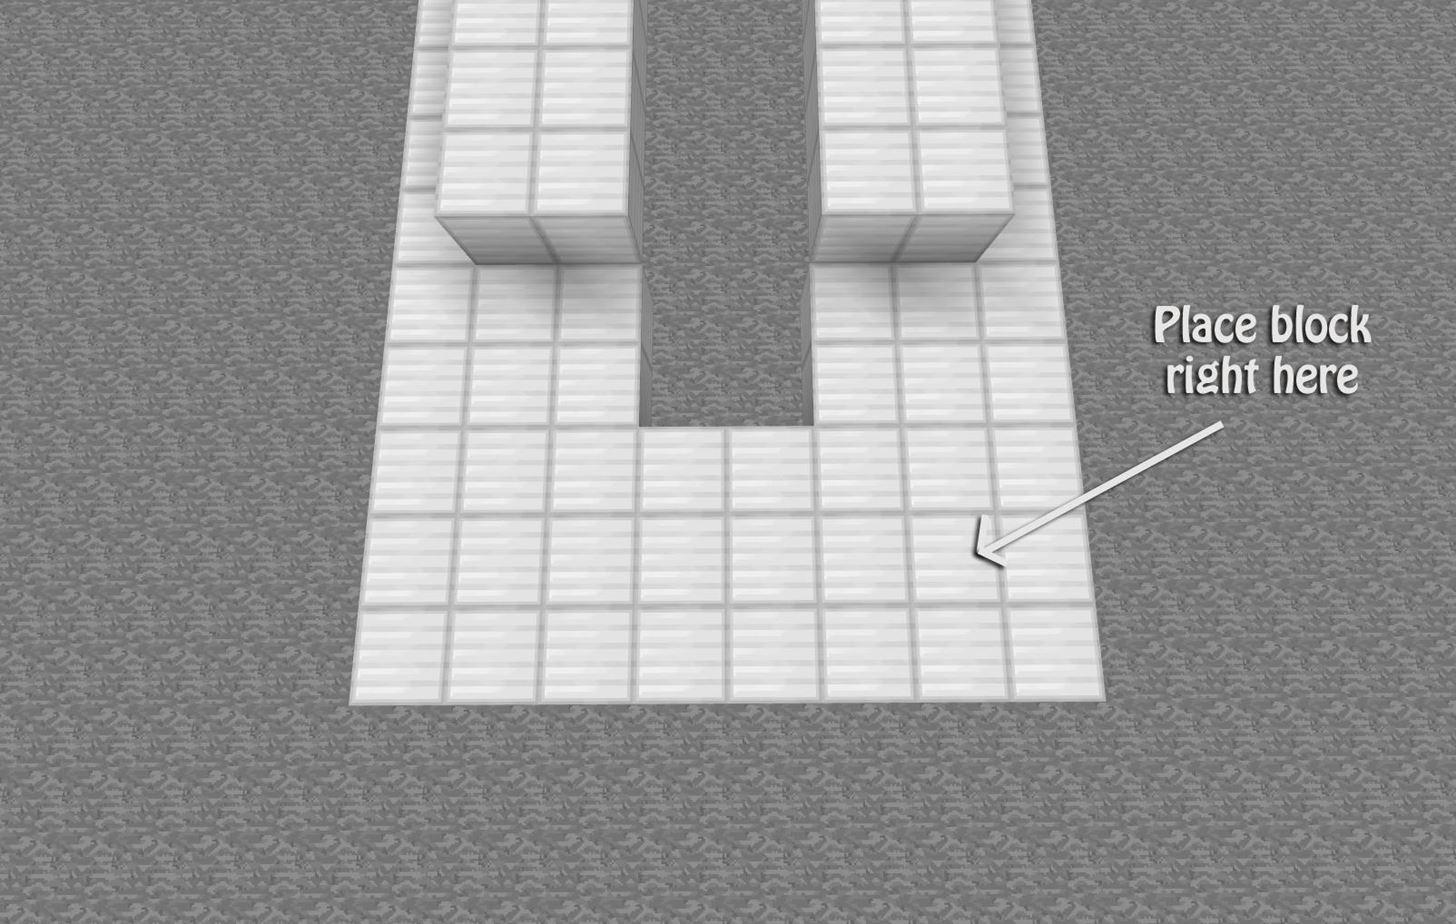 how to make a piston drawbridge in minecraft